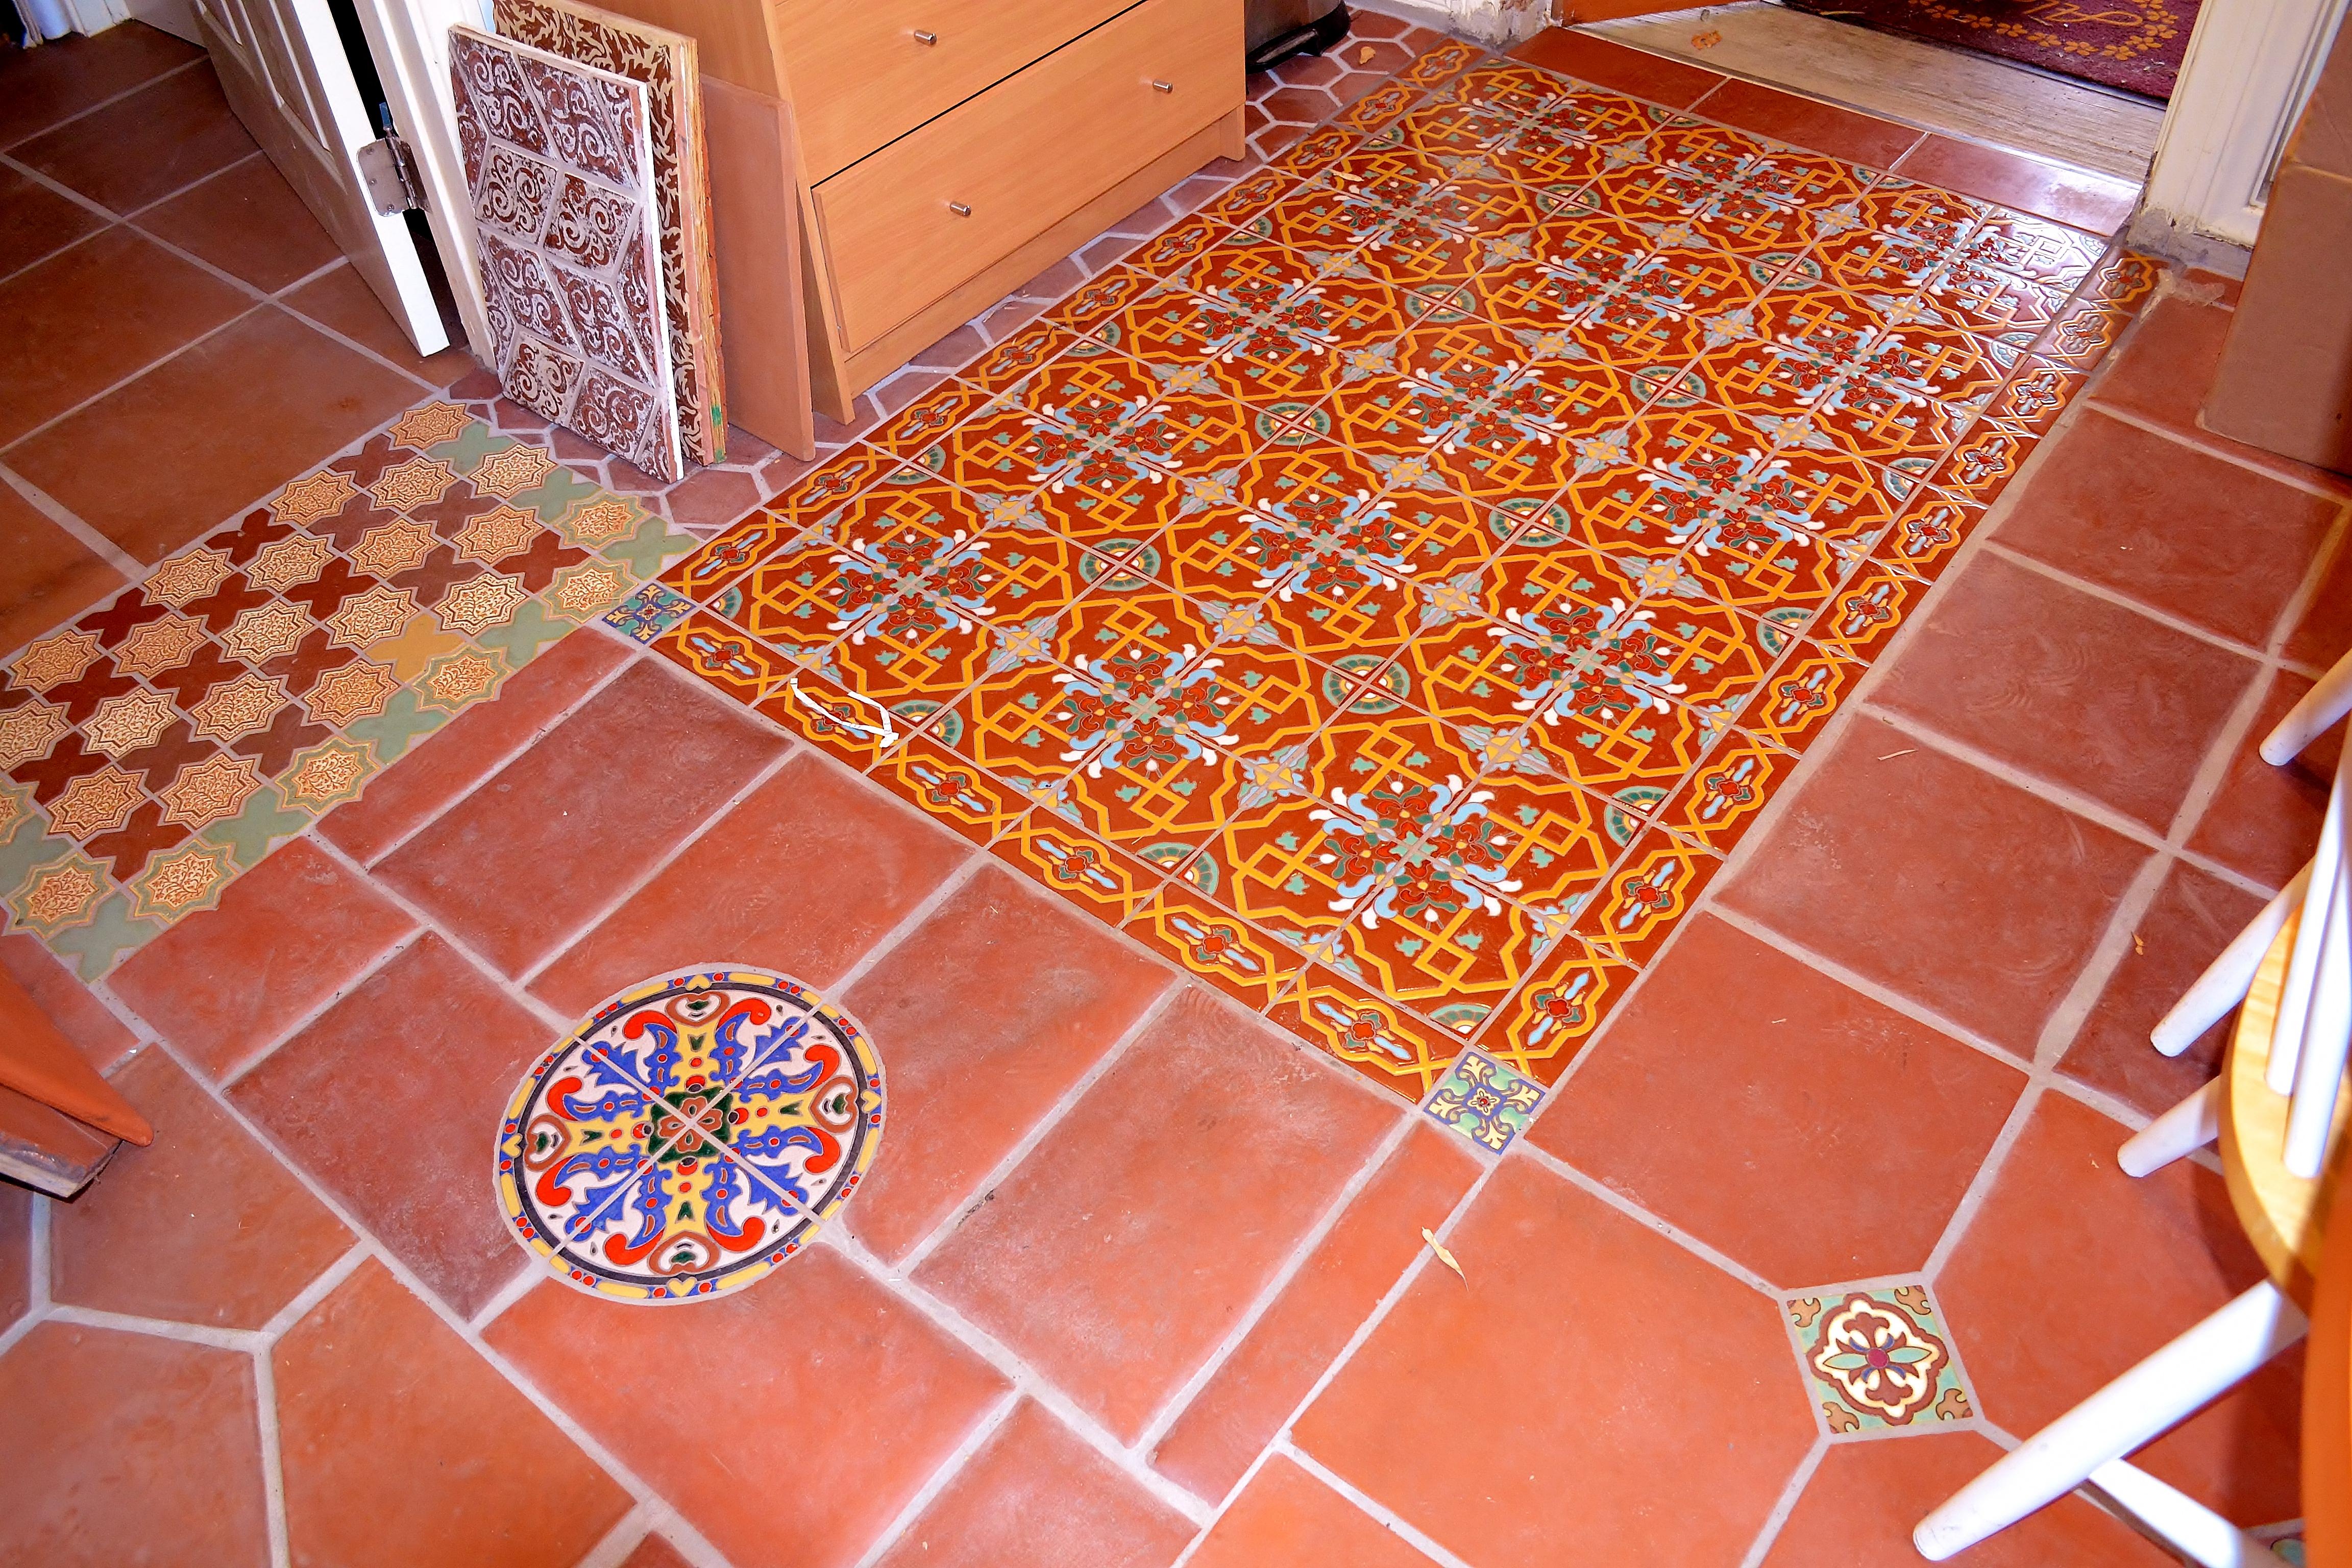 Ceramic tile floor patterns designs joy studio design for Spanish style floor tiles